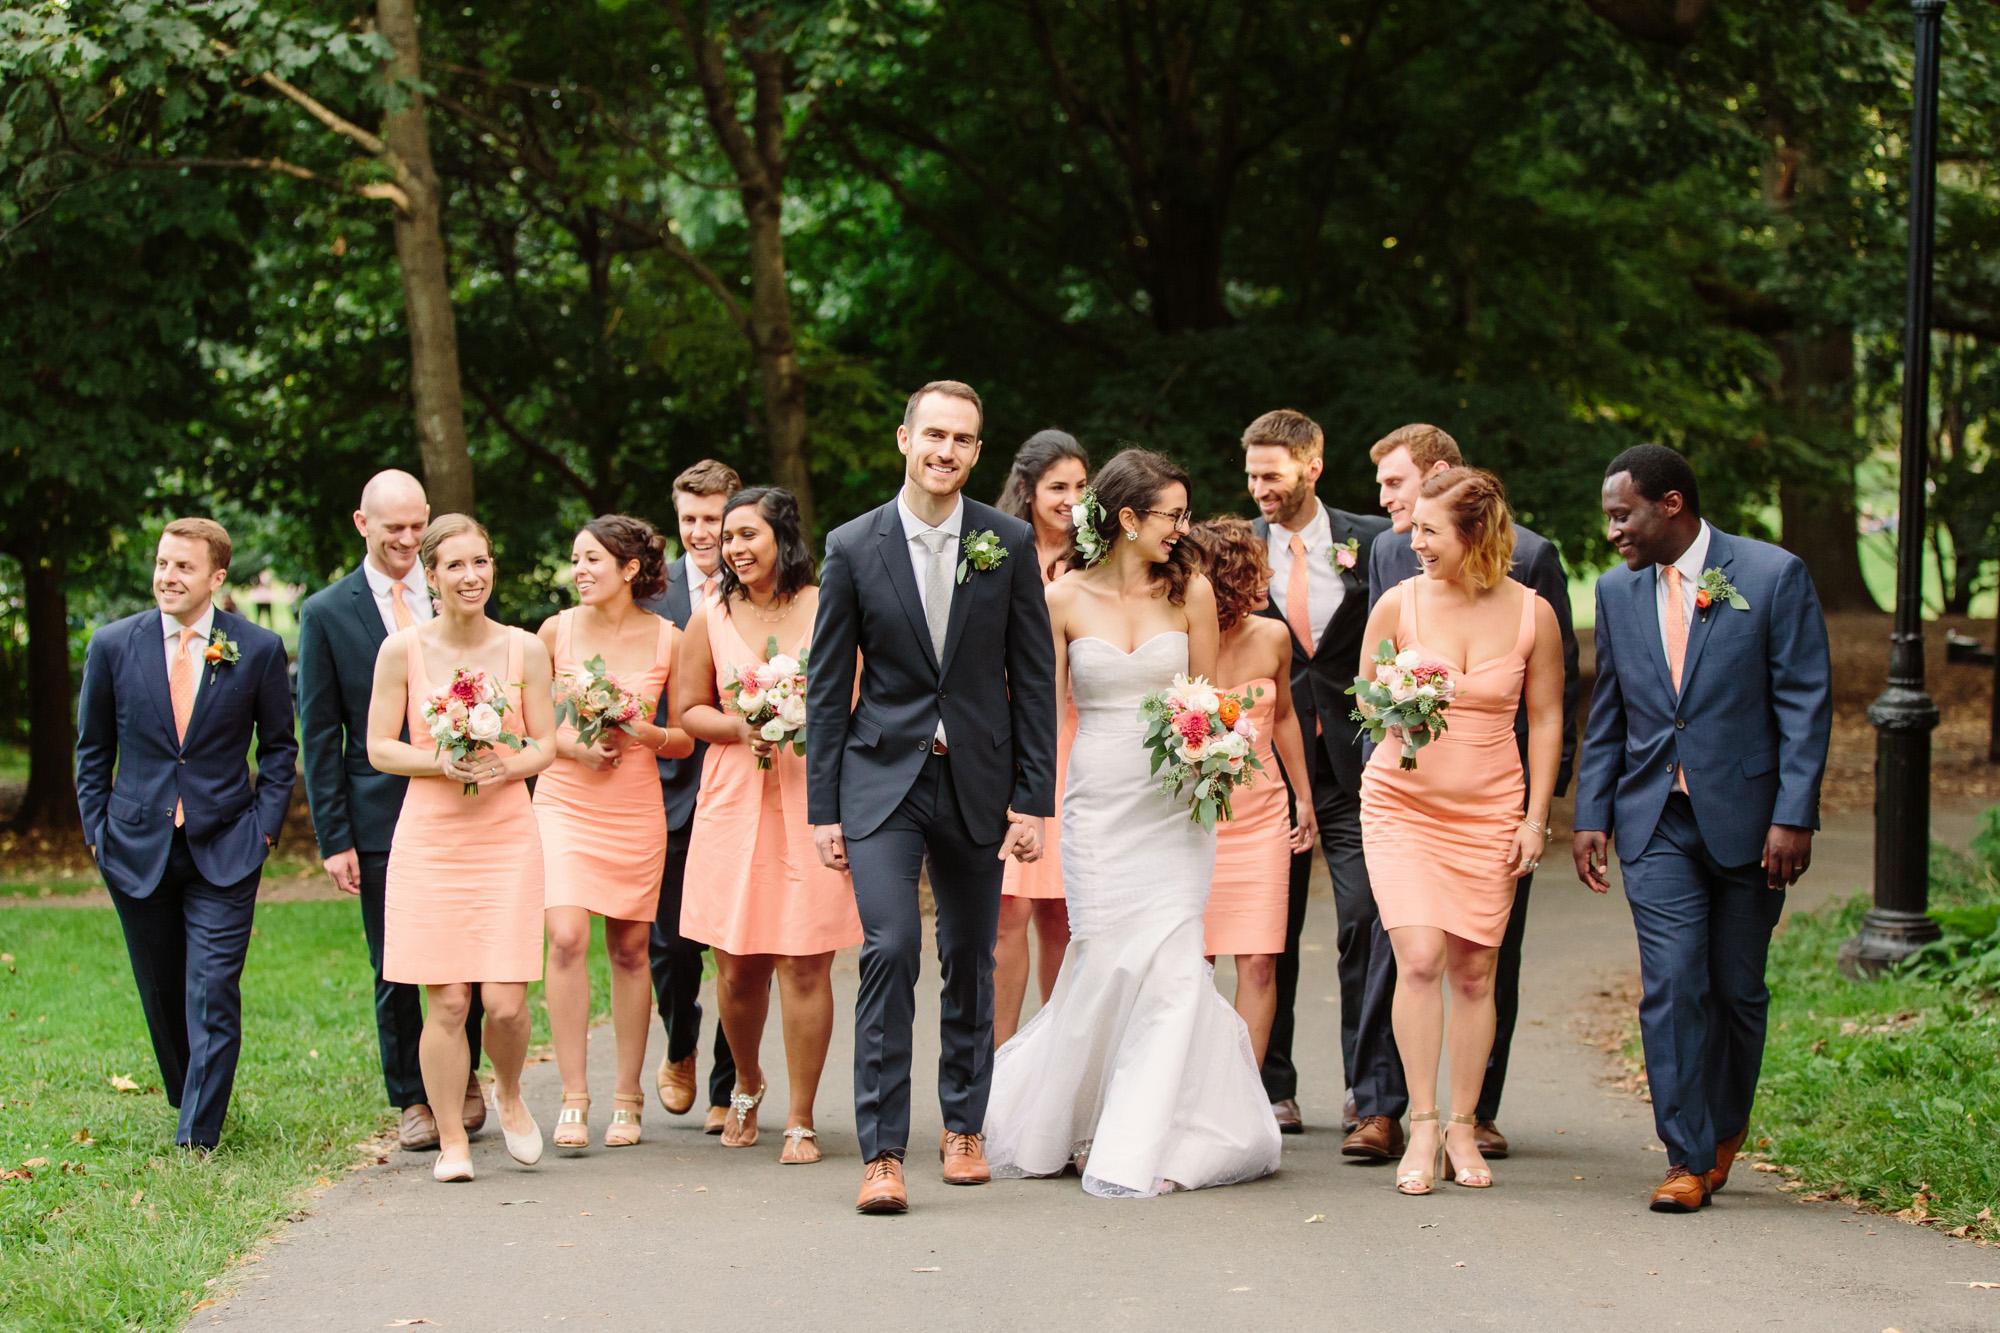 25_Kate_Sam_Picnic_House_Wedding_Brooklyn_NY_Tanya_Salazar_Photography_423.jpg